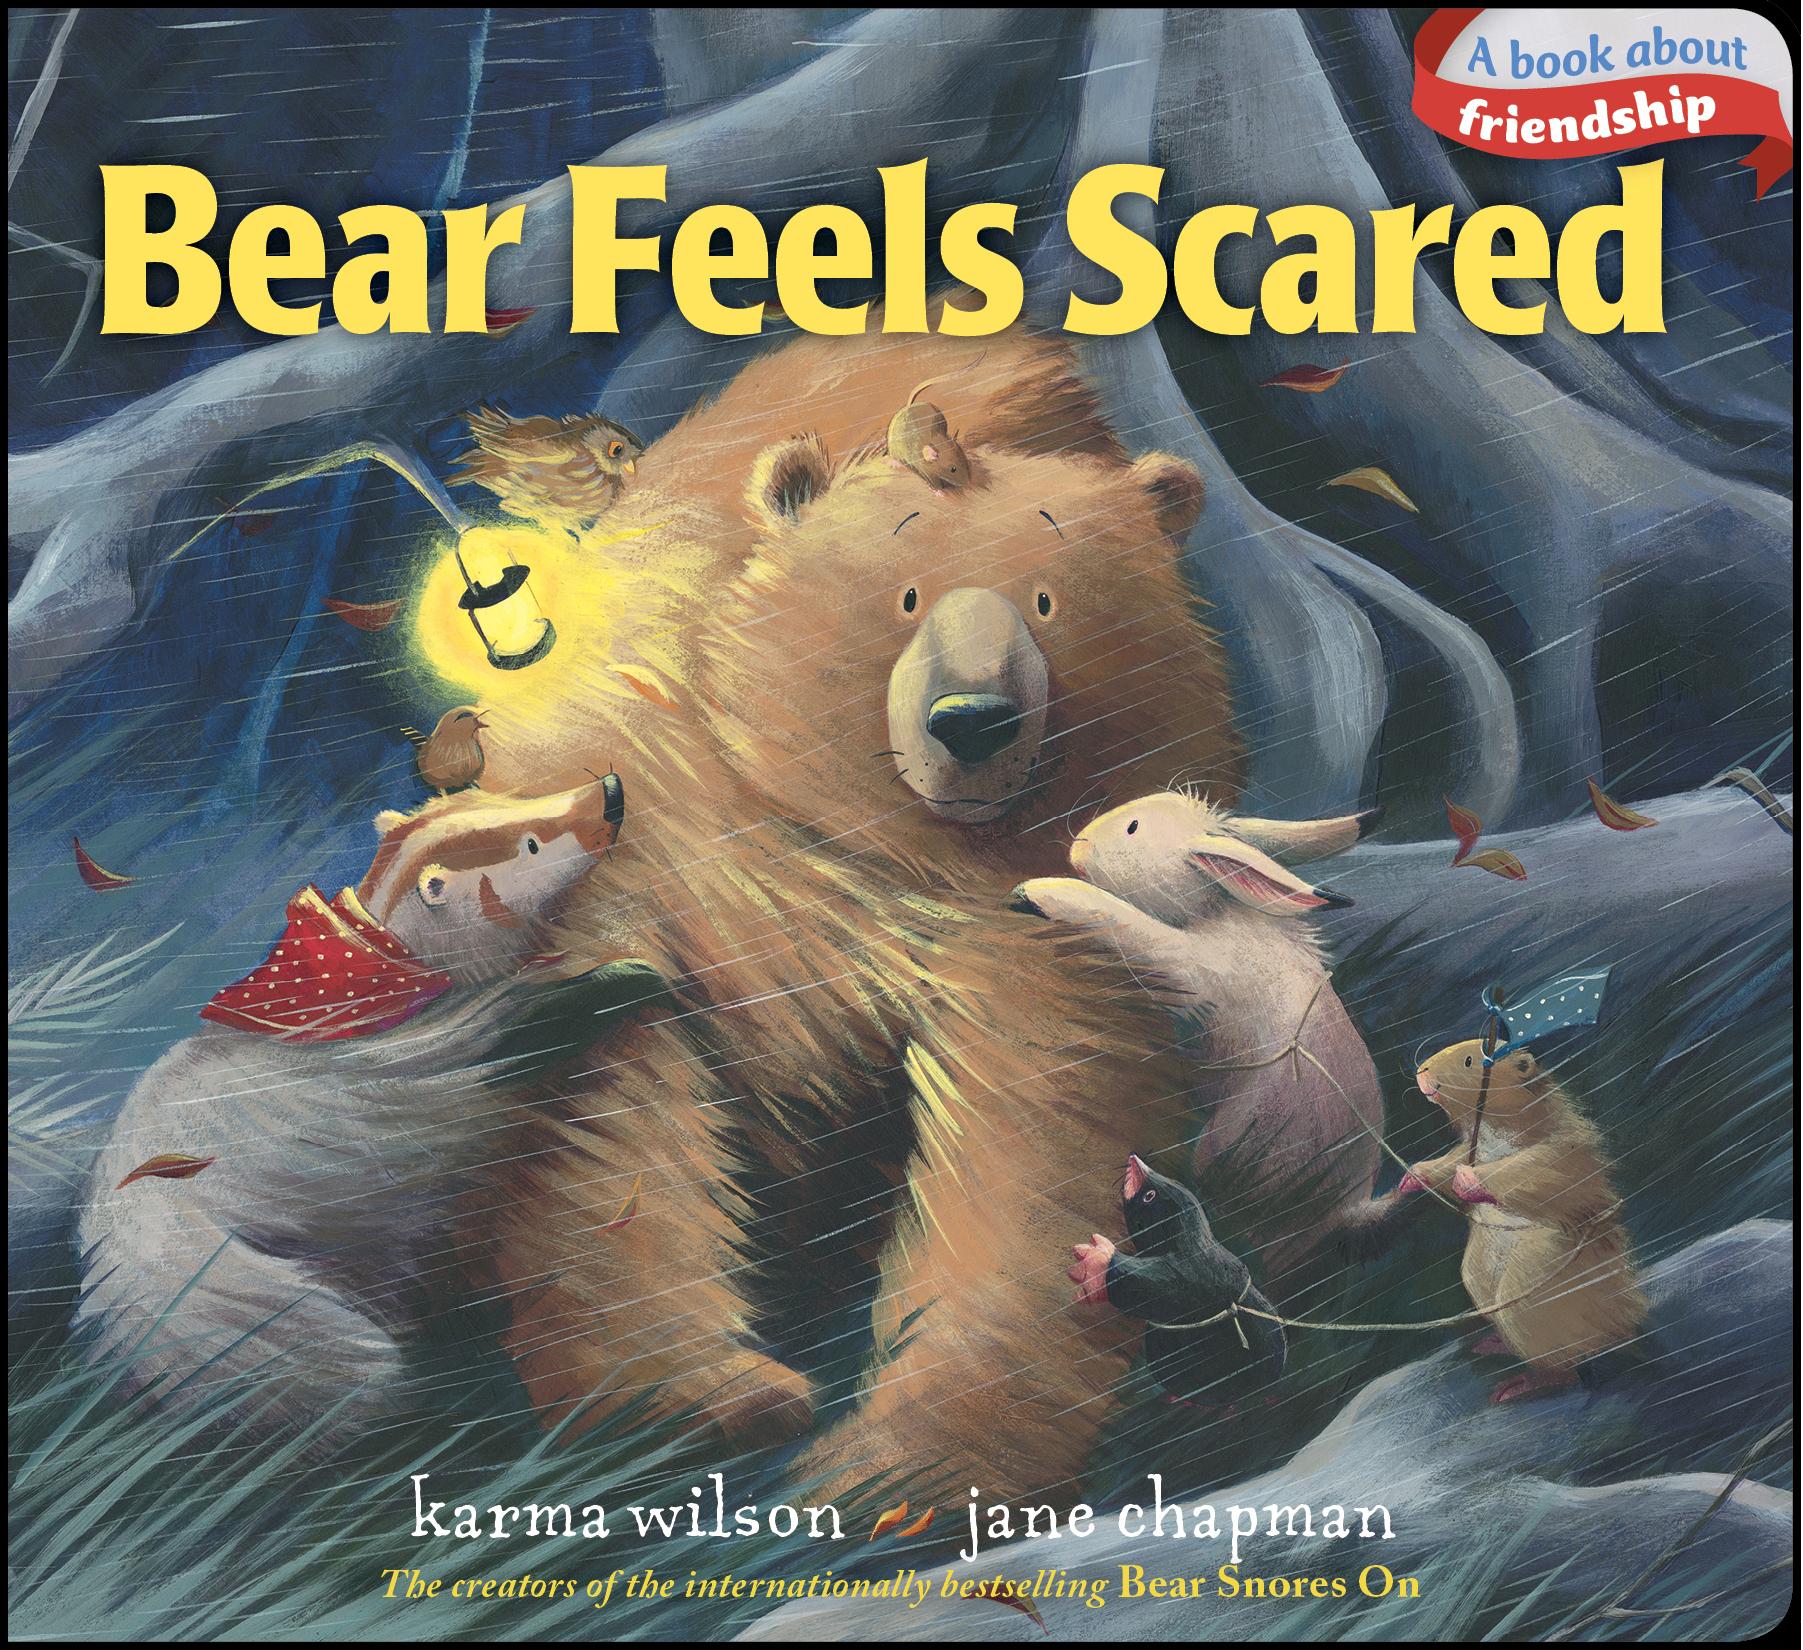 bear feels scared book by karma wilson jane chapman official